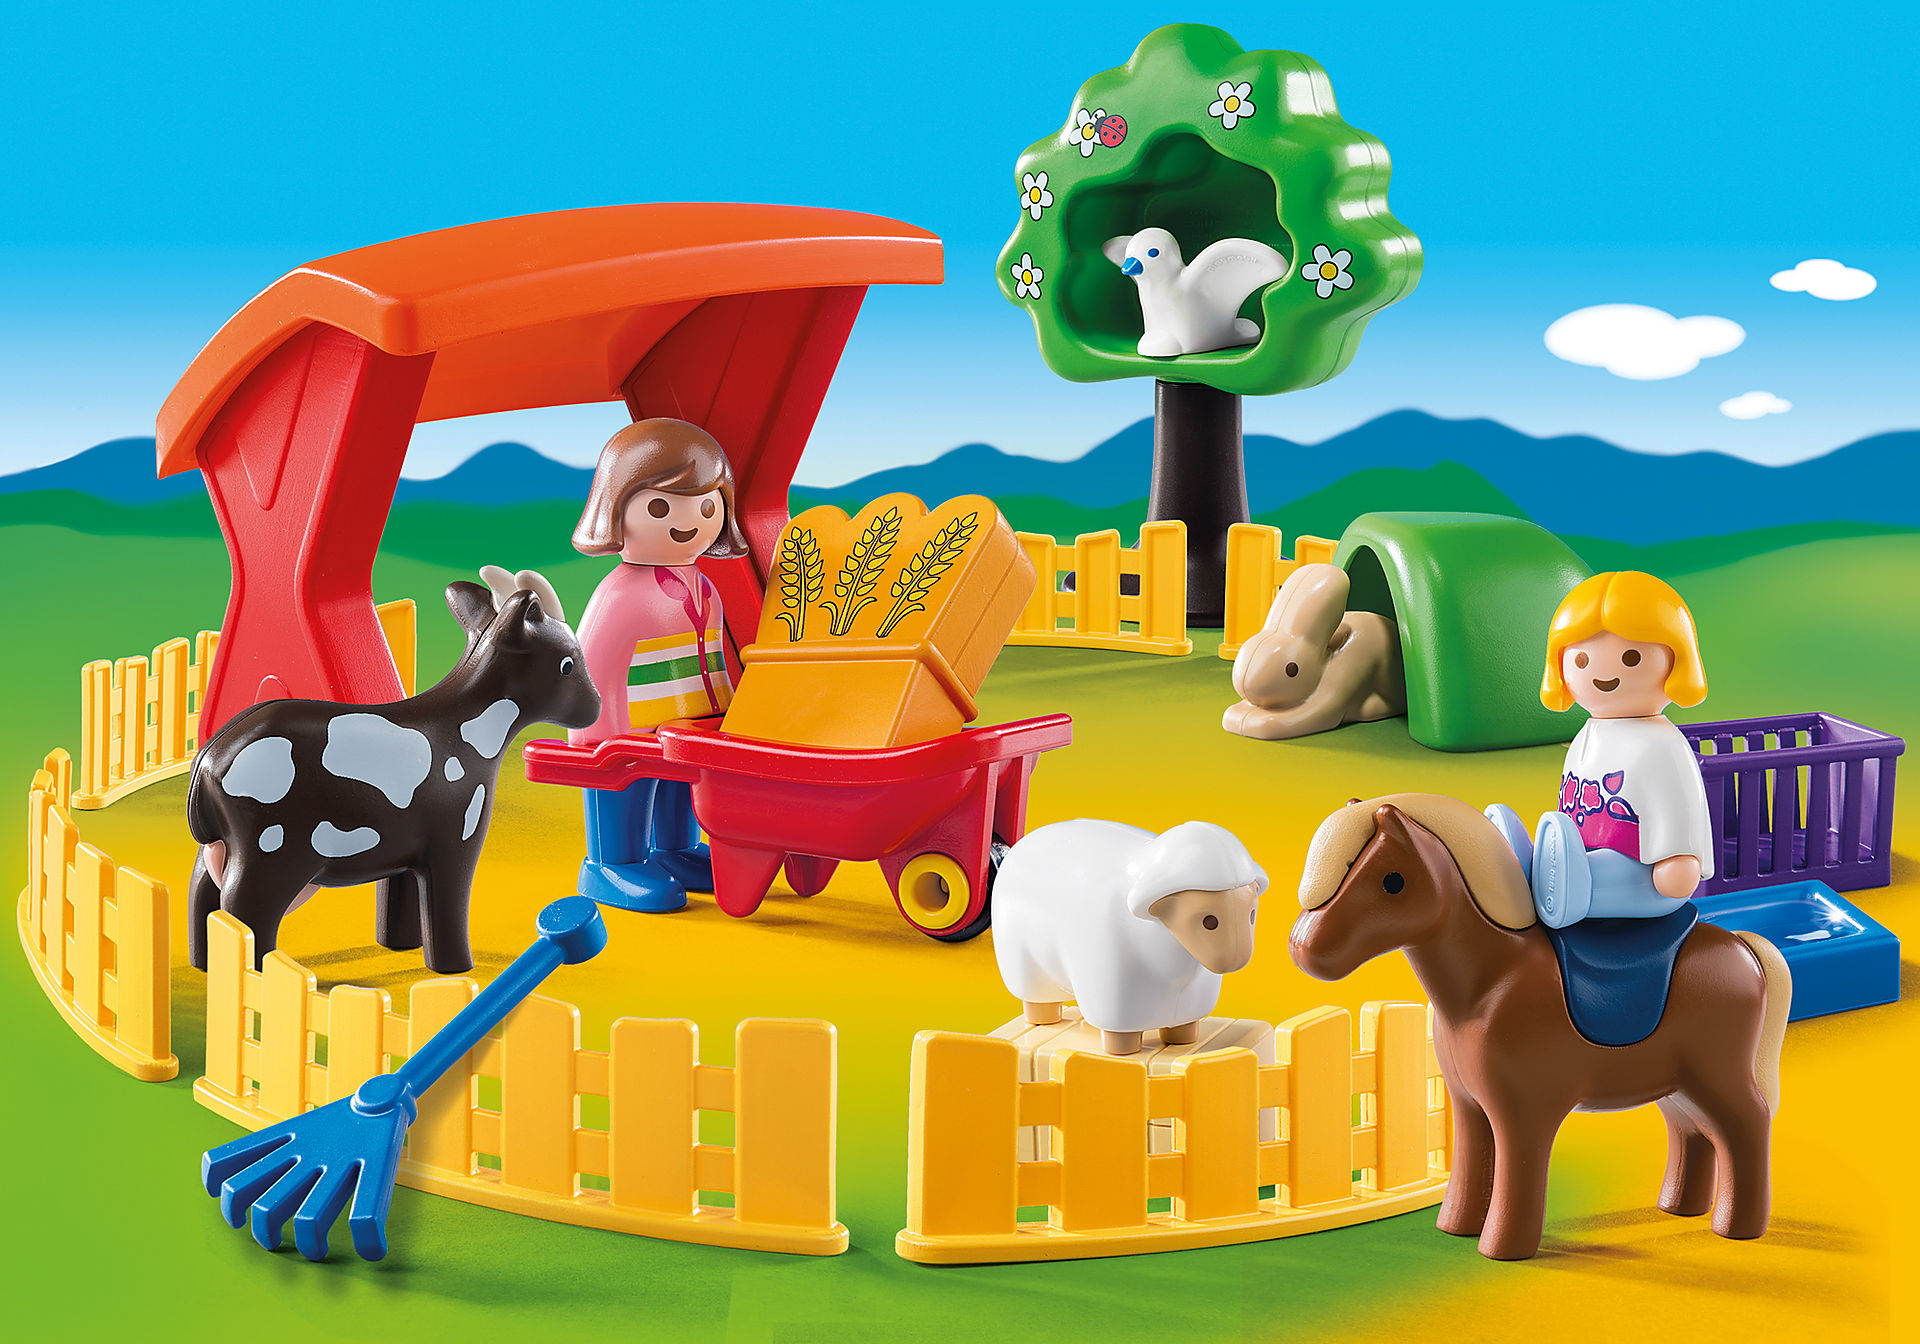 http://media.playmobil.com/i/playmobil/6963_product_detail/Kinderboerderij